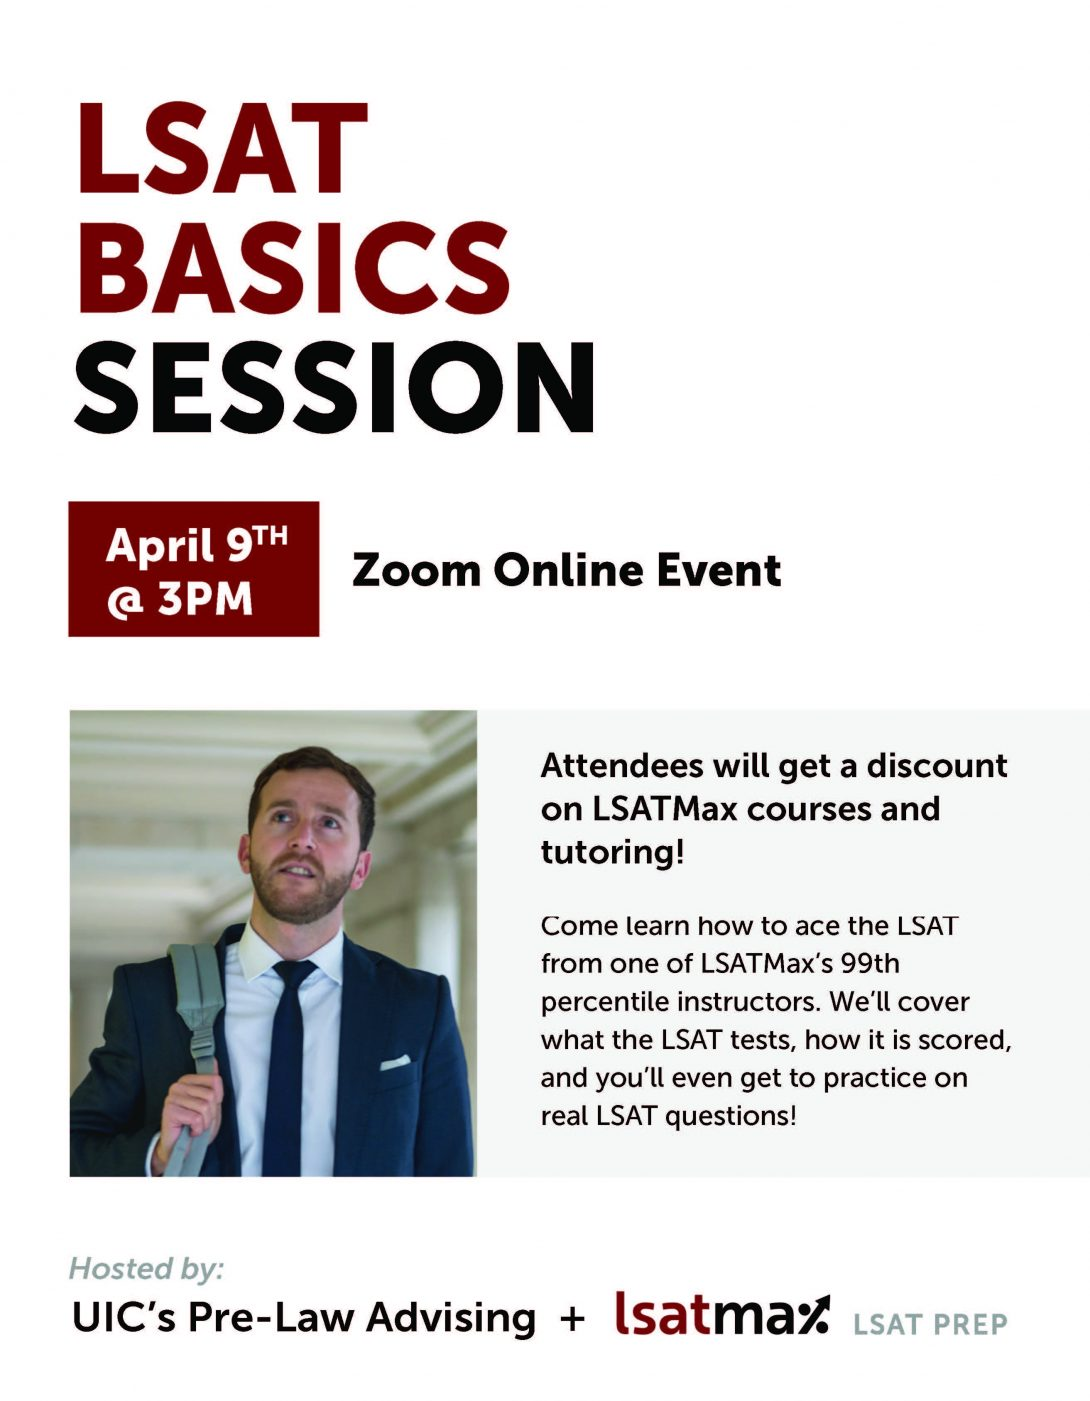 LSAT basics session with LSAT Max